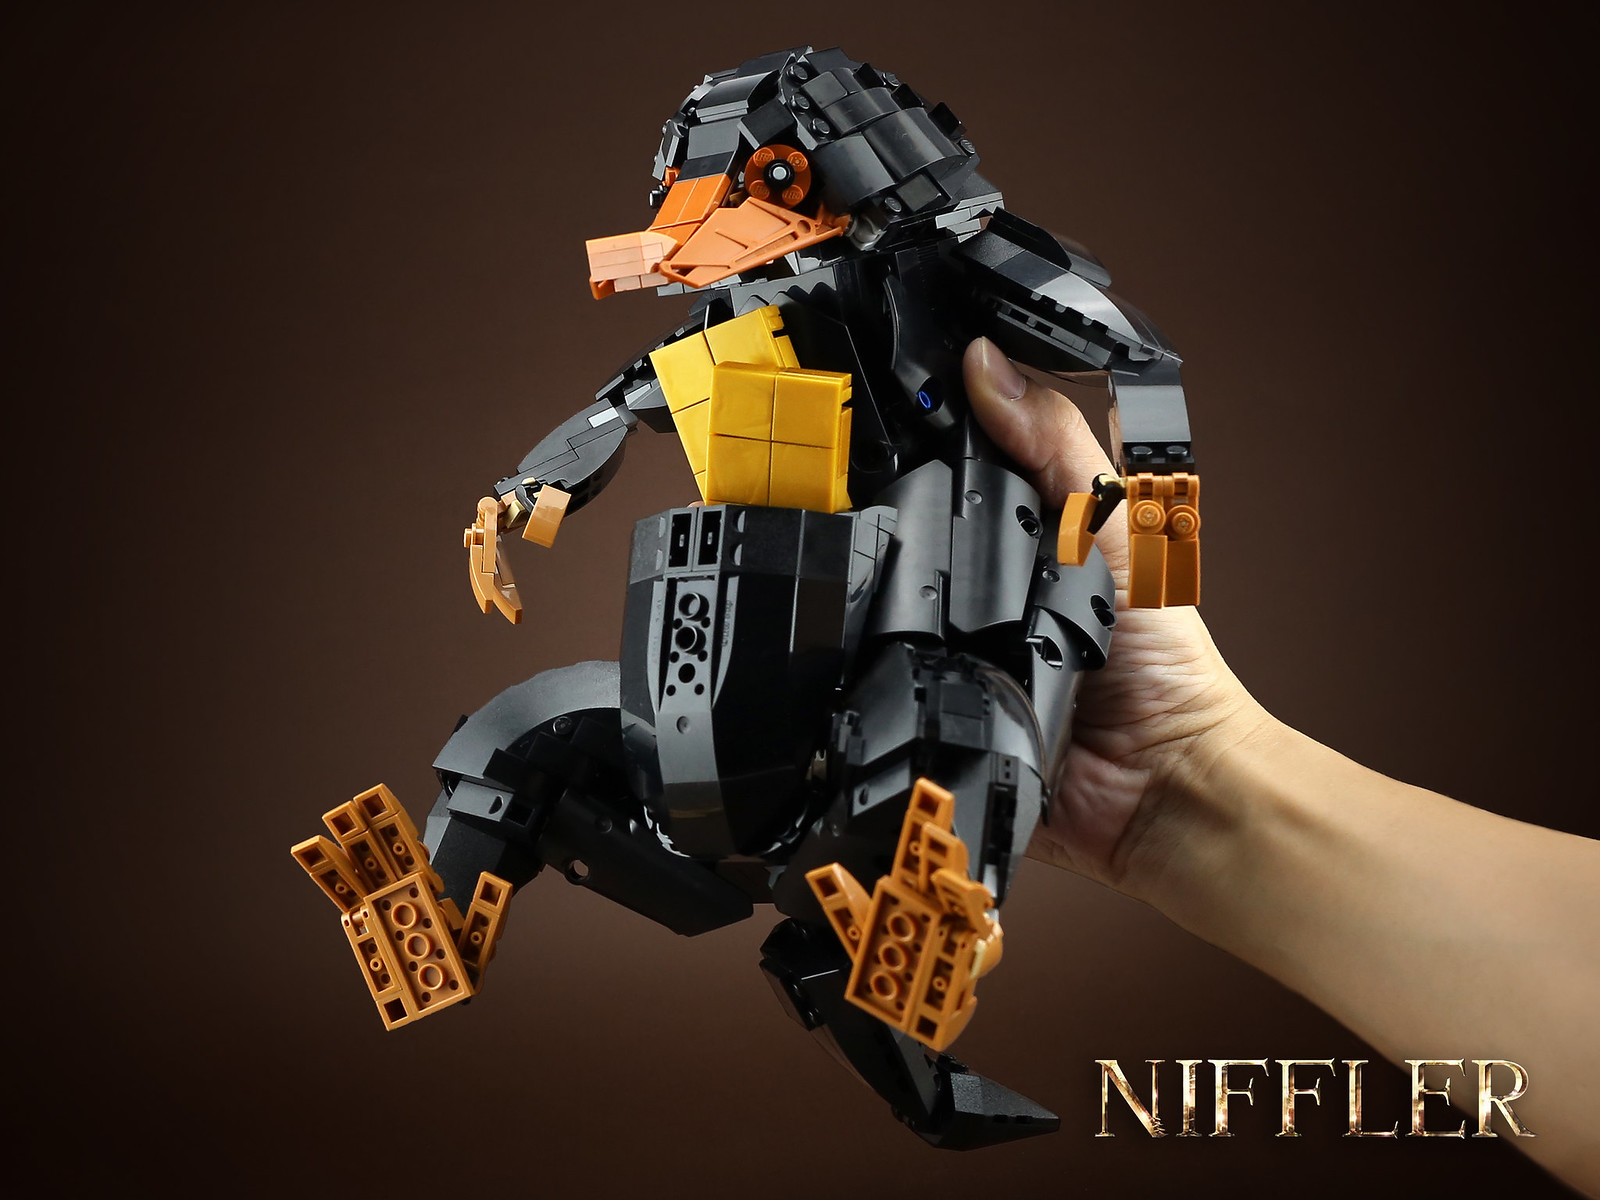 lego niffler